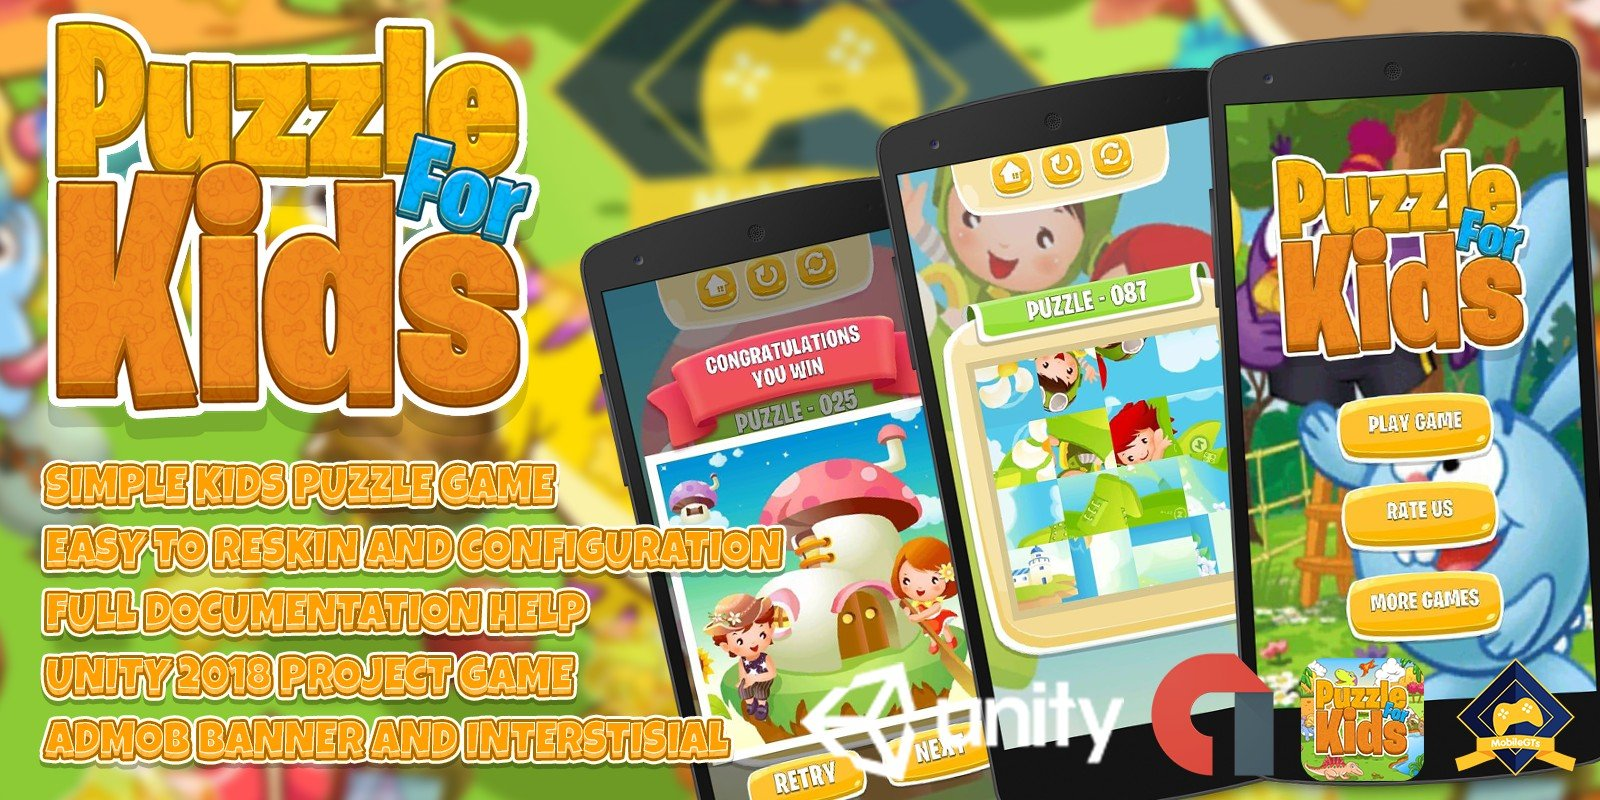 Puzzle Kids Game Unity 2018 Admob